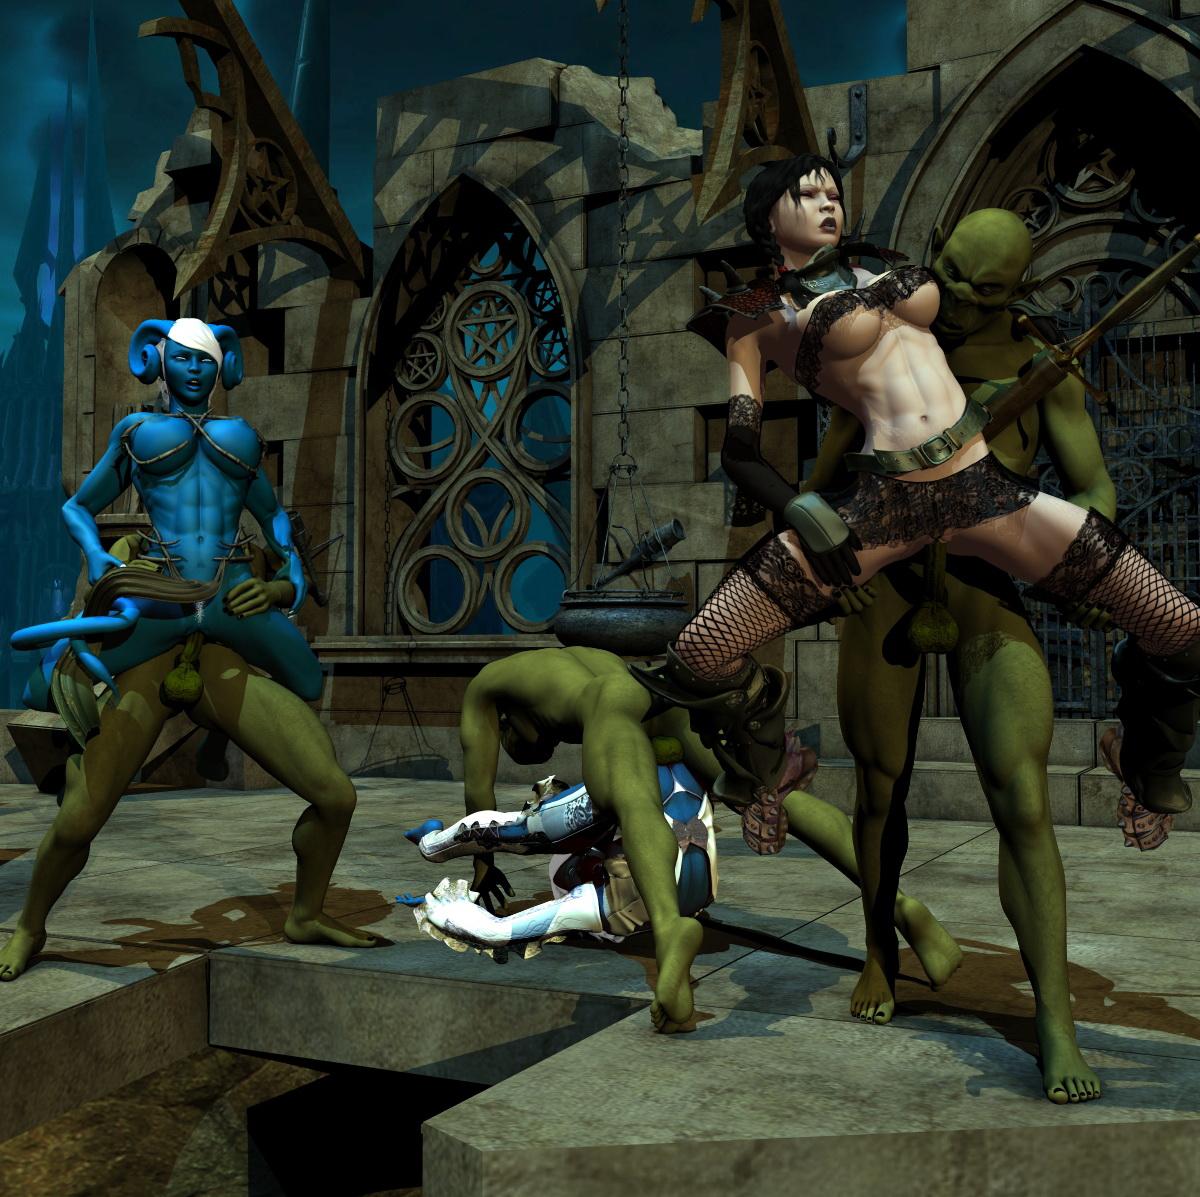 Naga picts erotic pic